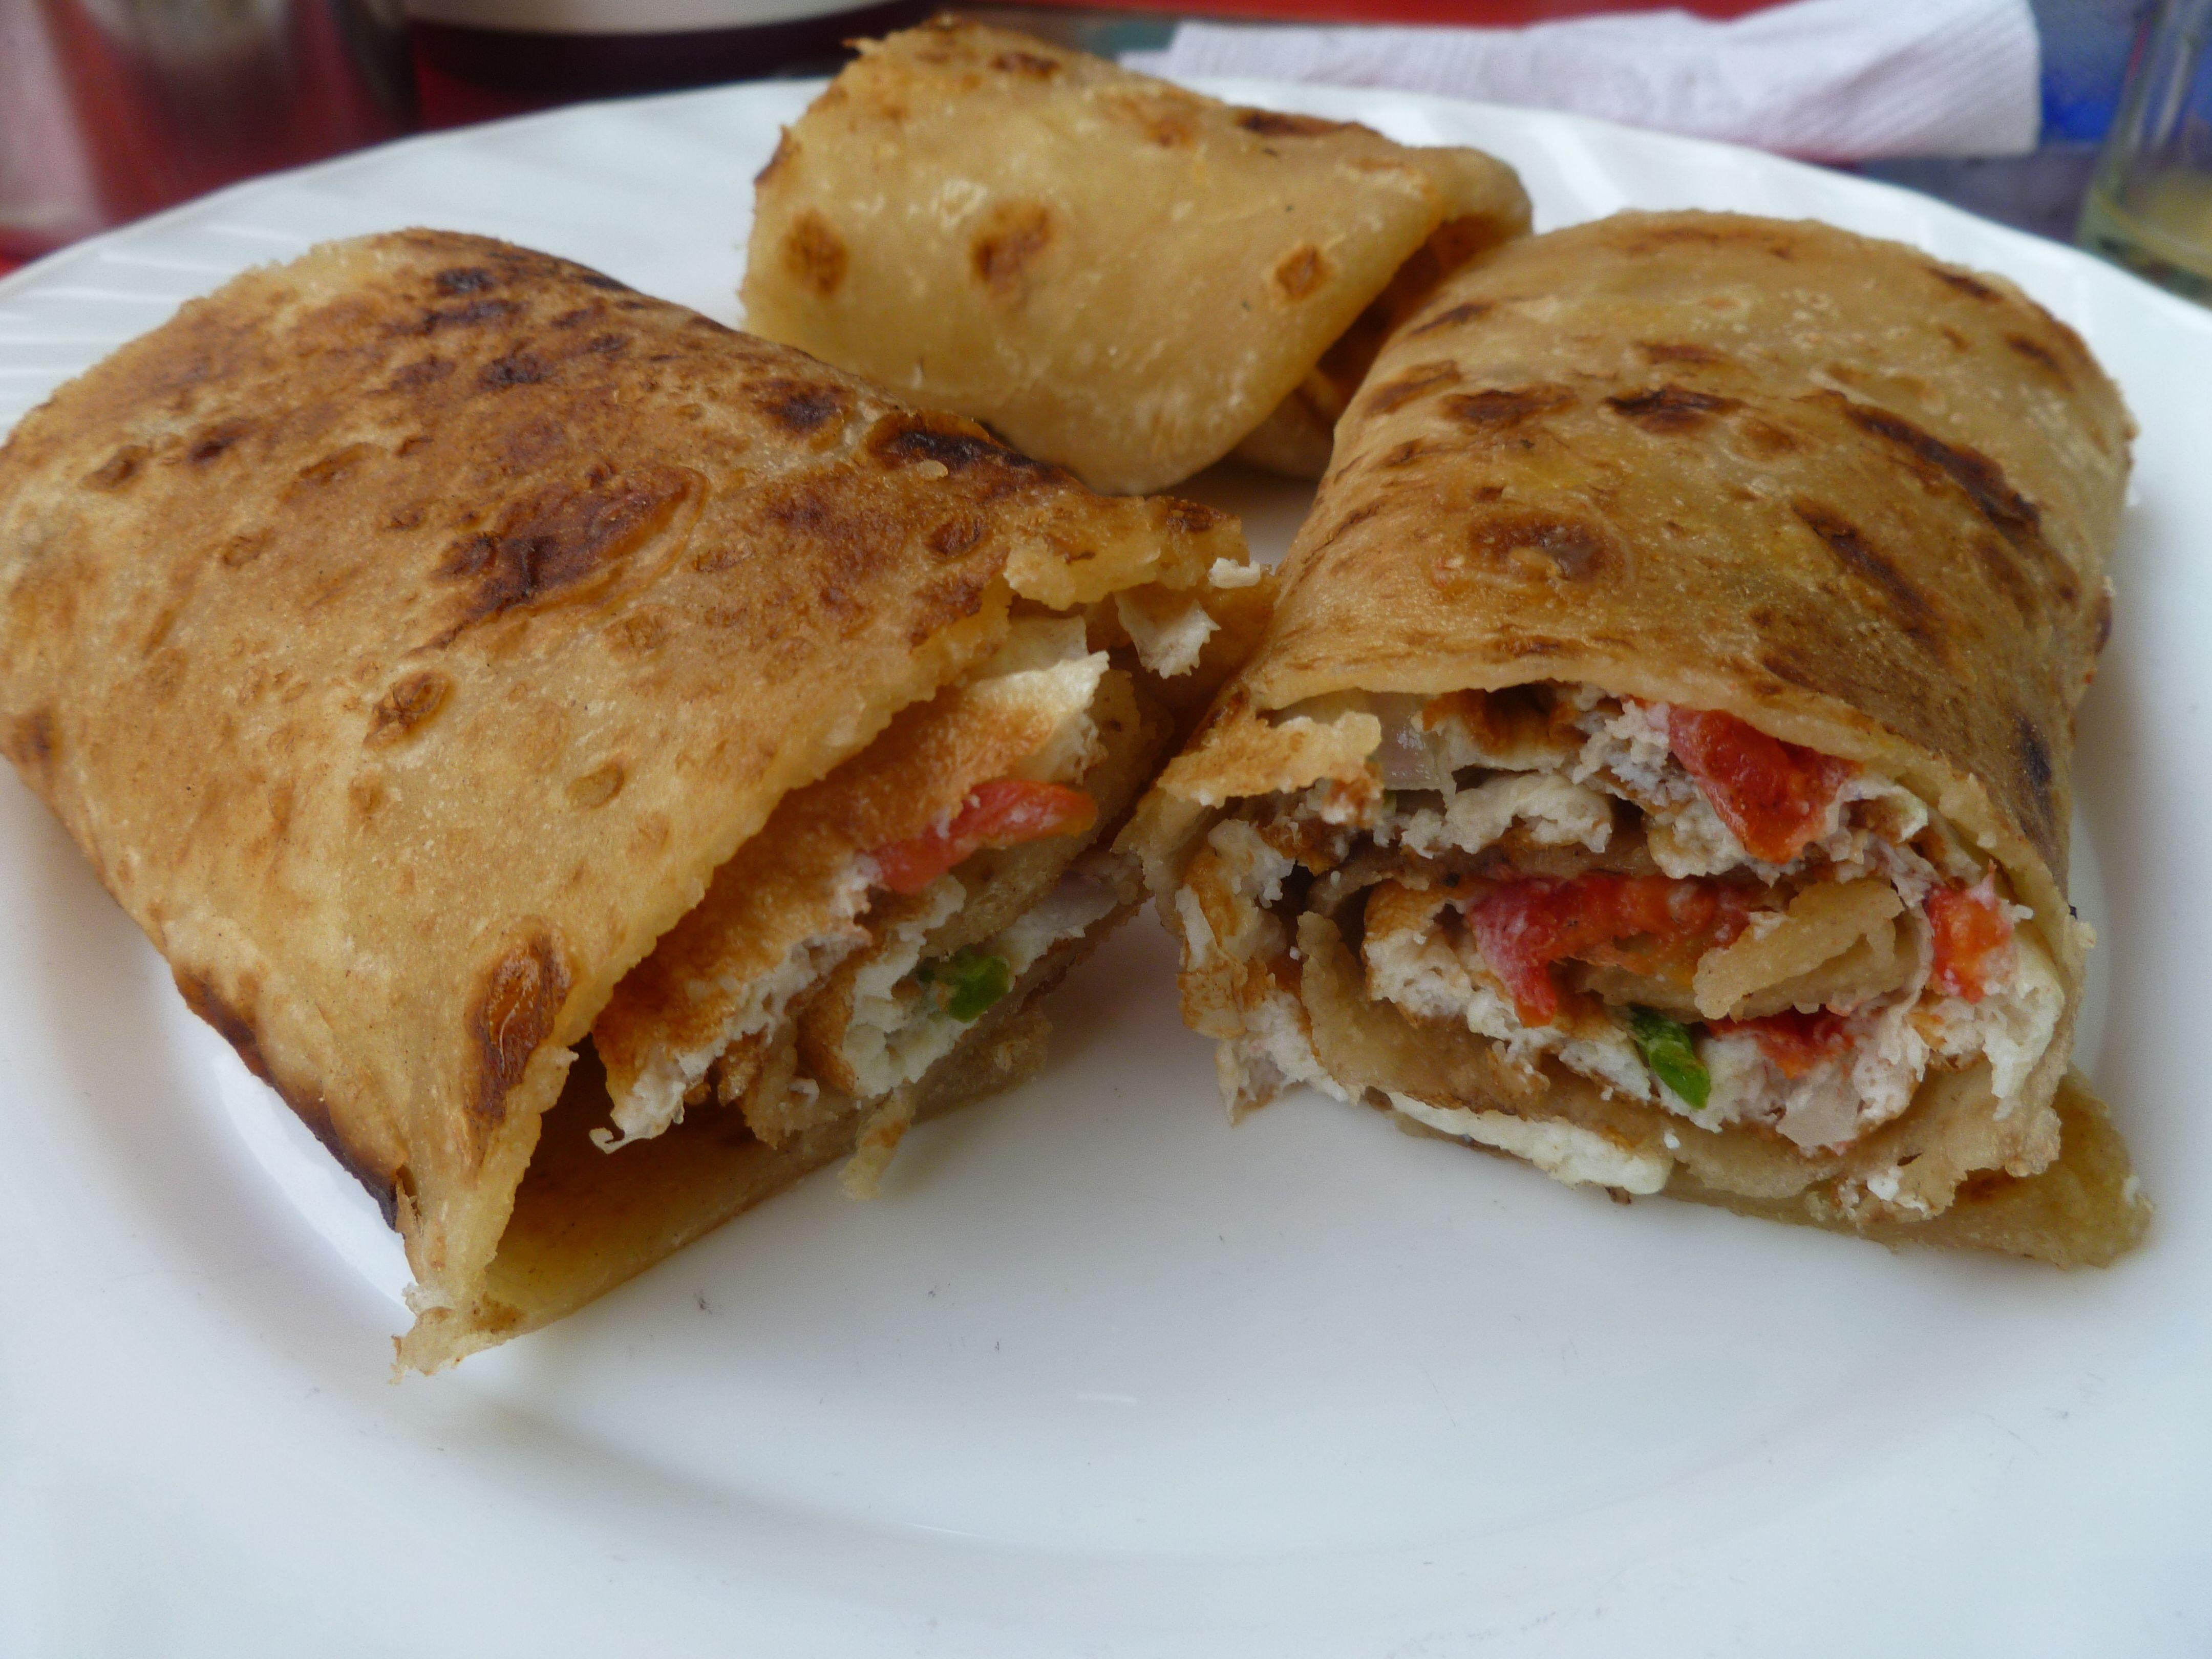 Ugandan street food, called a Rolex It\u0027s a omelette wrapped